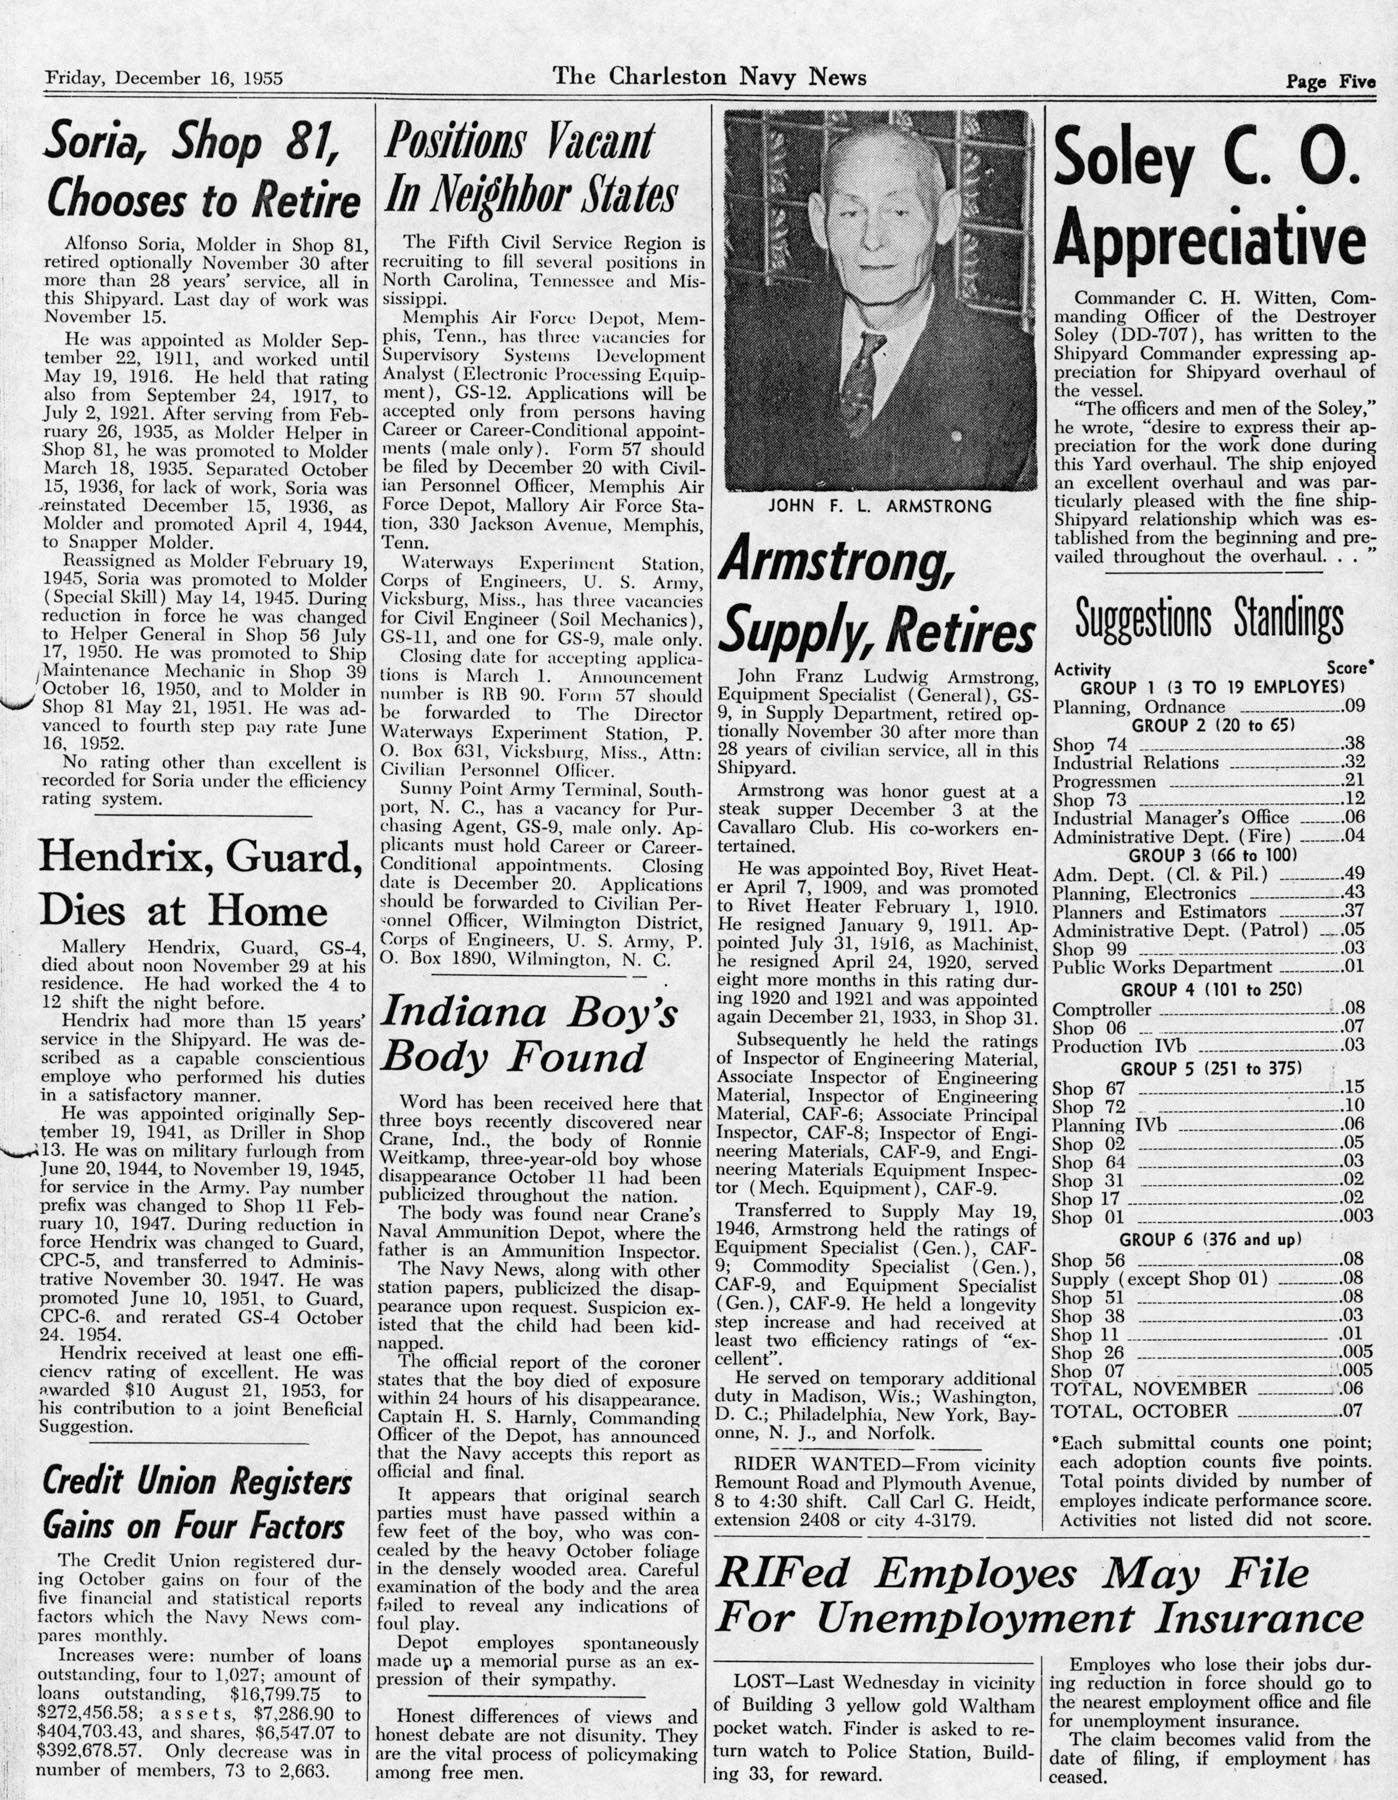 The Charleston Navy News, Volume 14, Edition 11, page v